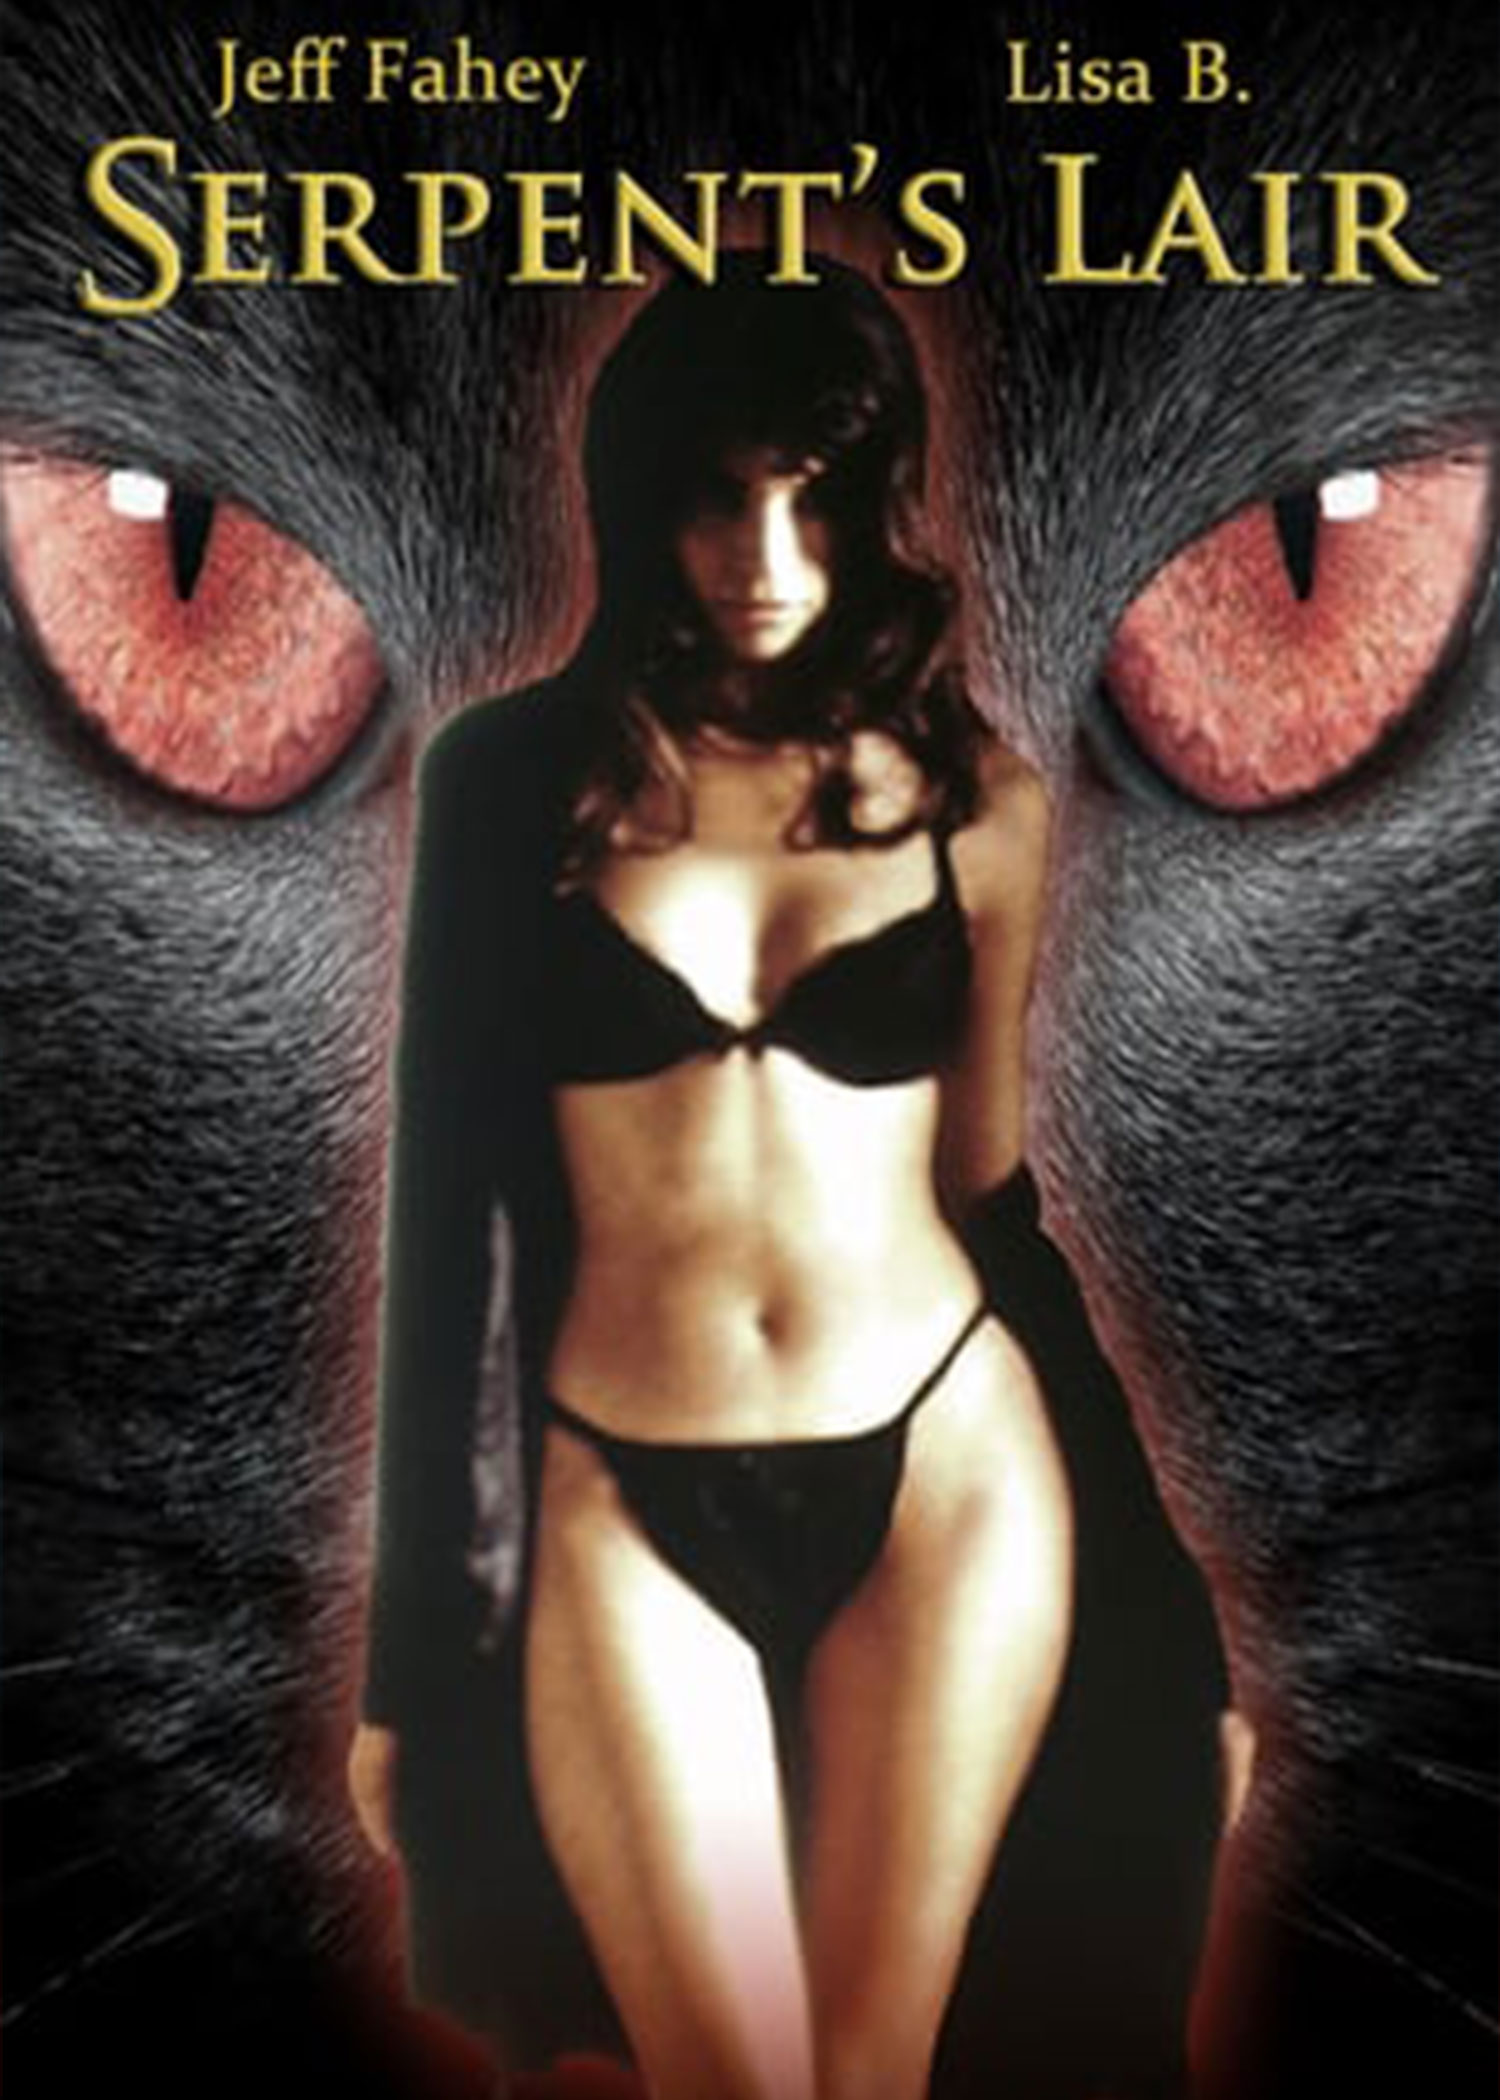 Erotic confessions 1997 season 4 episode 6 through an open window sd skinmaxtv - 3 3